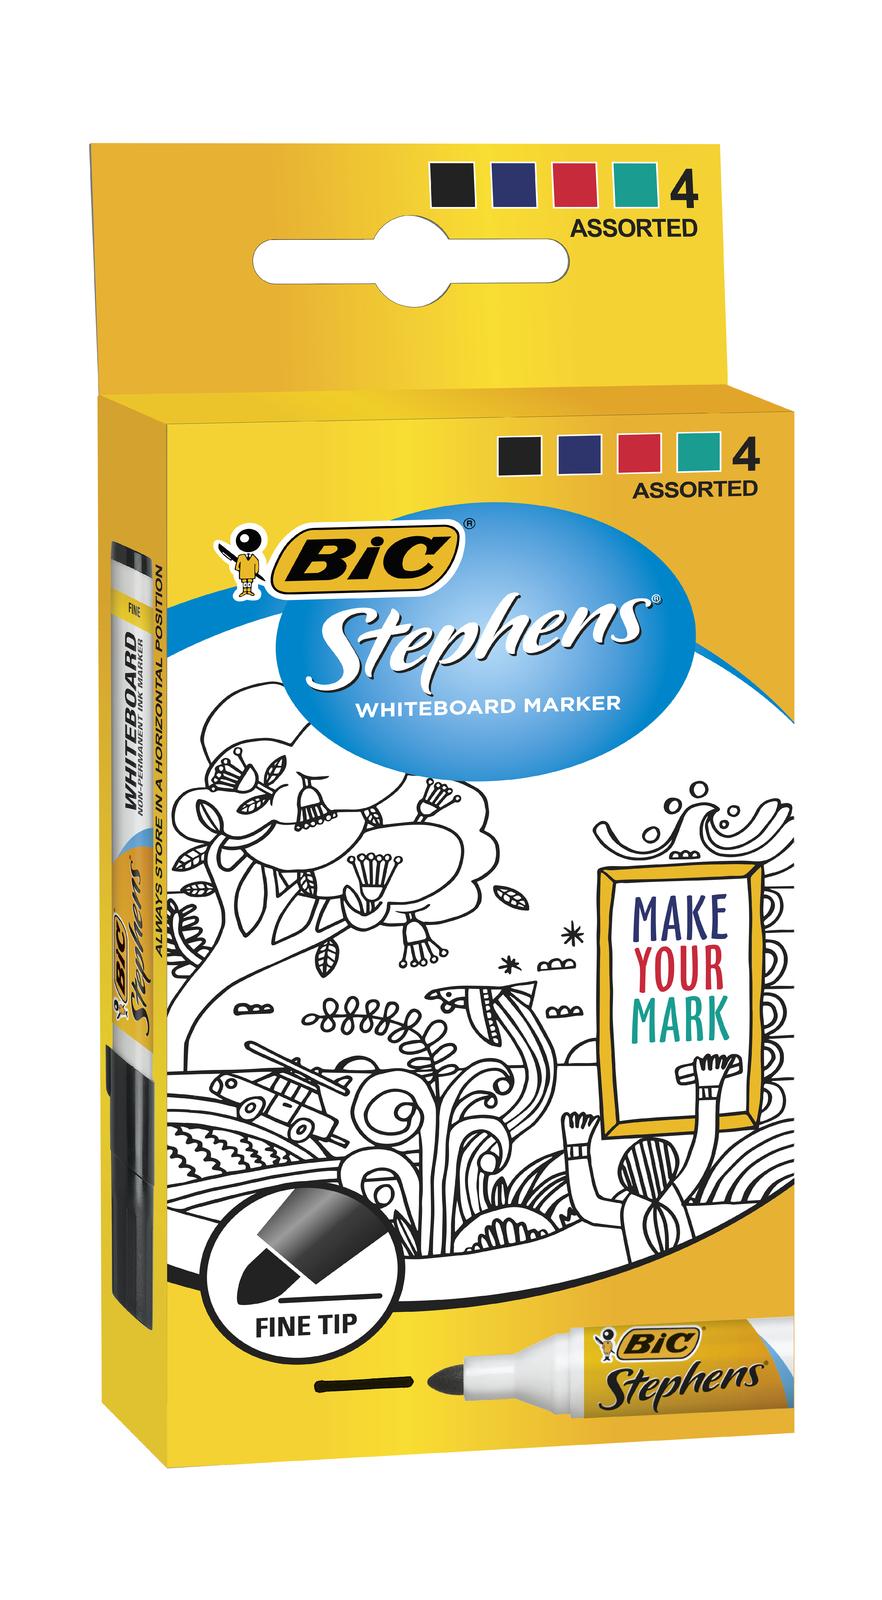 Bic: Whiteboard Marker - Fine Tip (Pack of 4) image